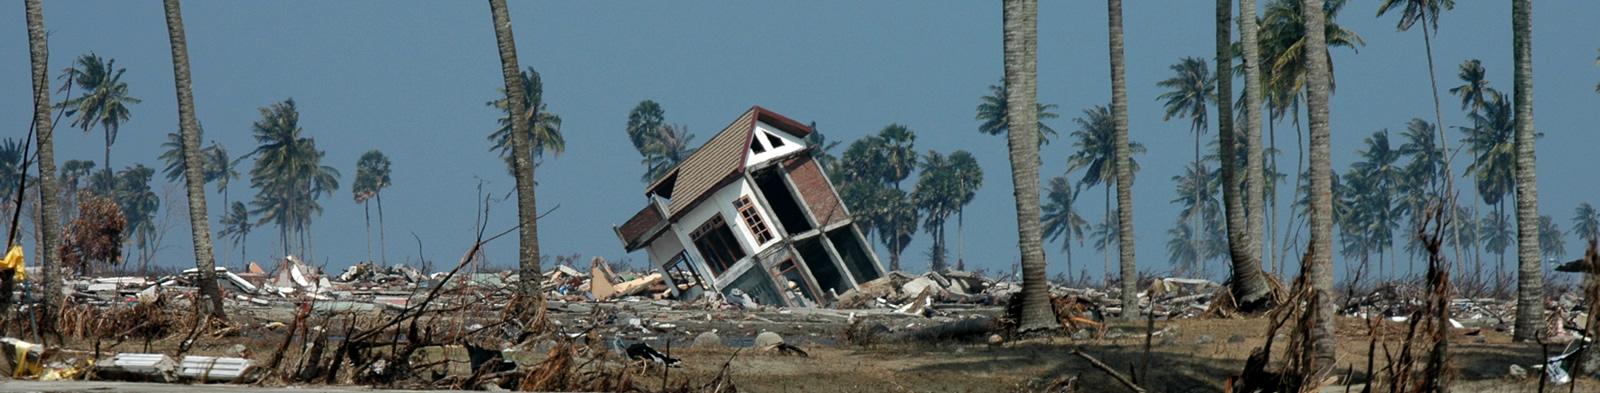 Landscape destroyed by a tsunami